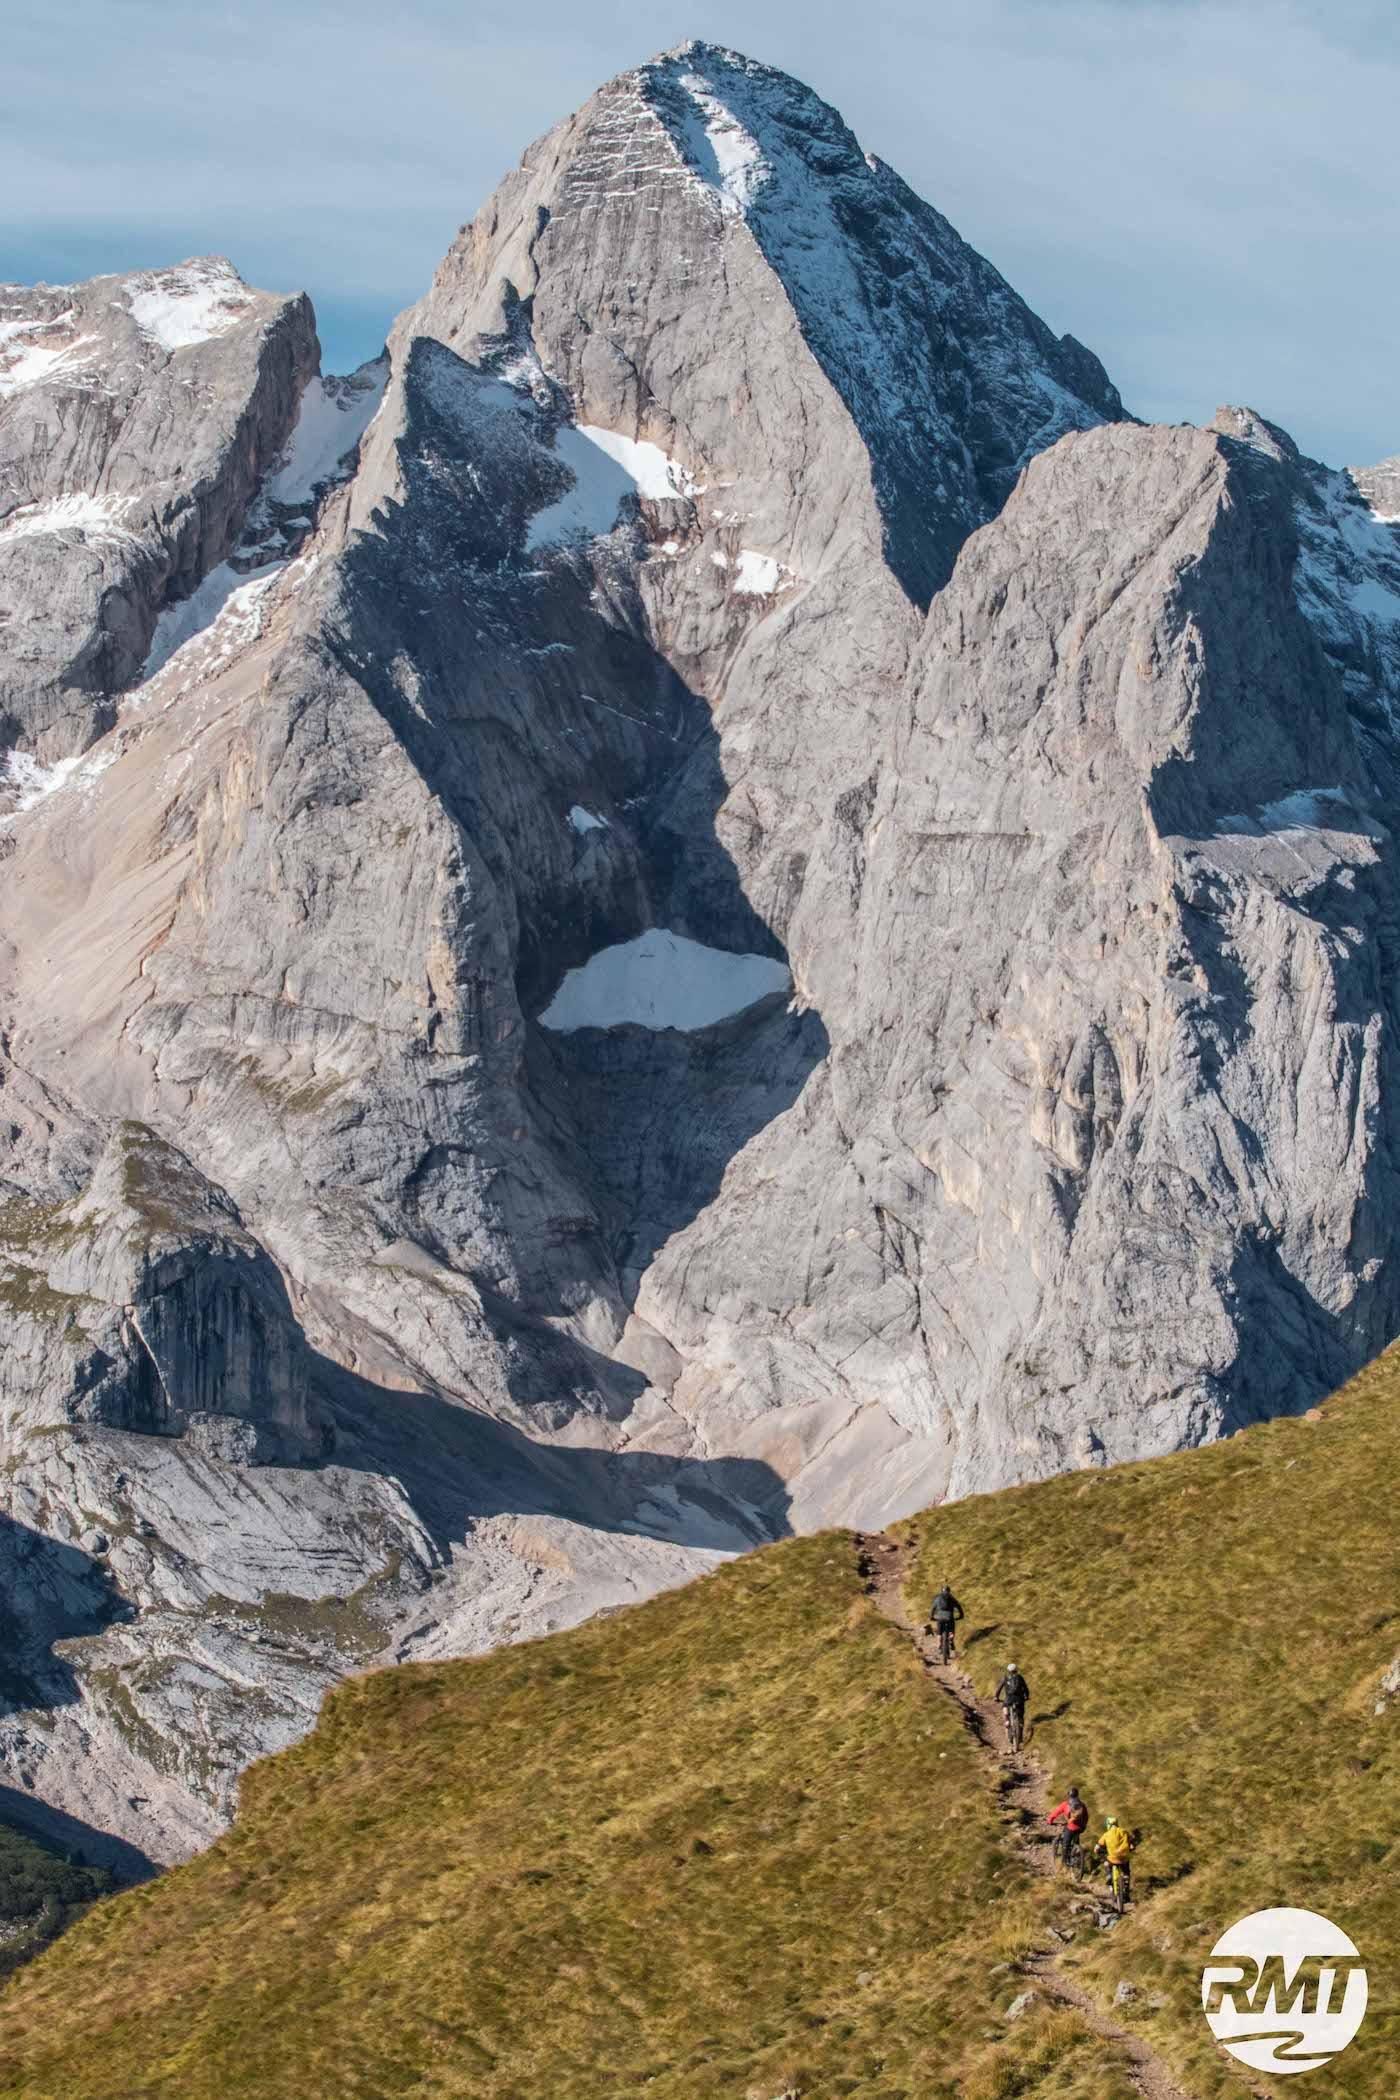 DolomitenCross auf Trails Dolomiten Runde Tour MTB TransAlp Rock my Trail Bikeschule -63